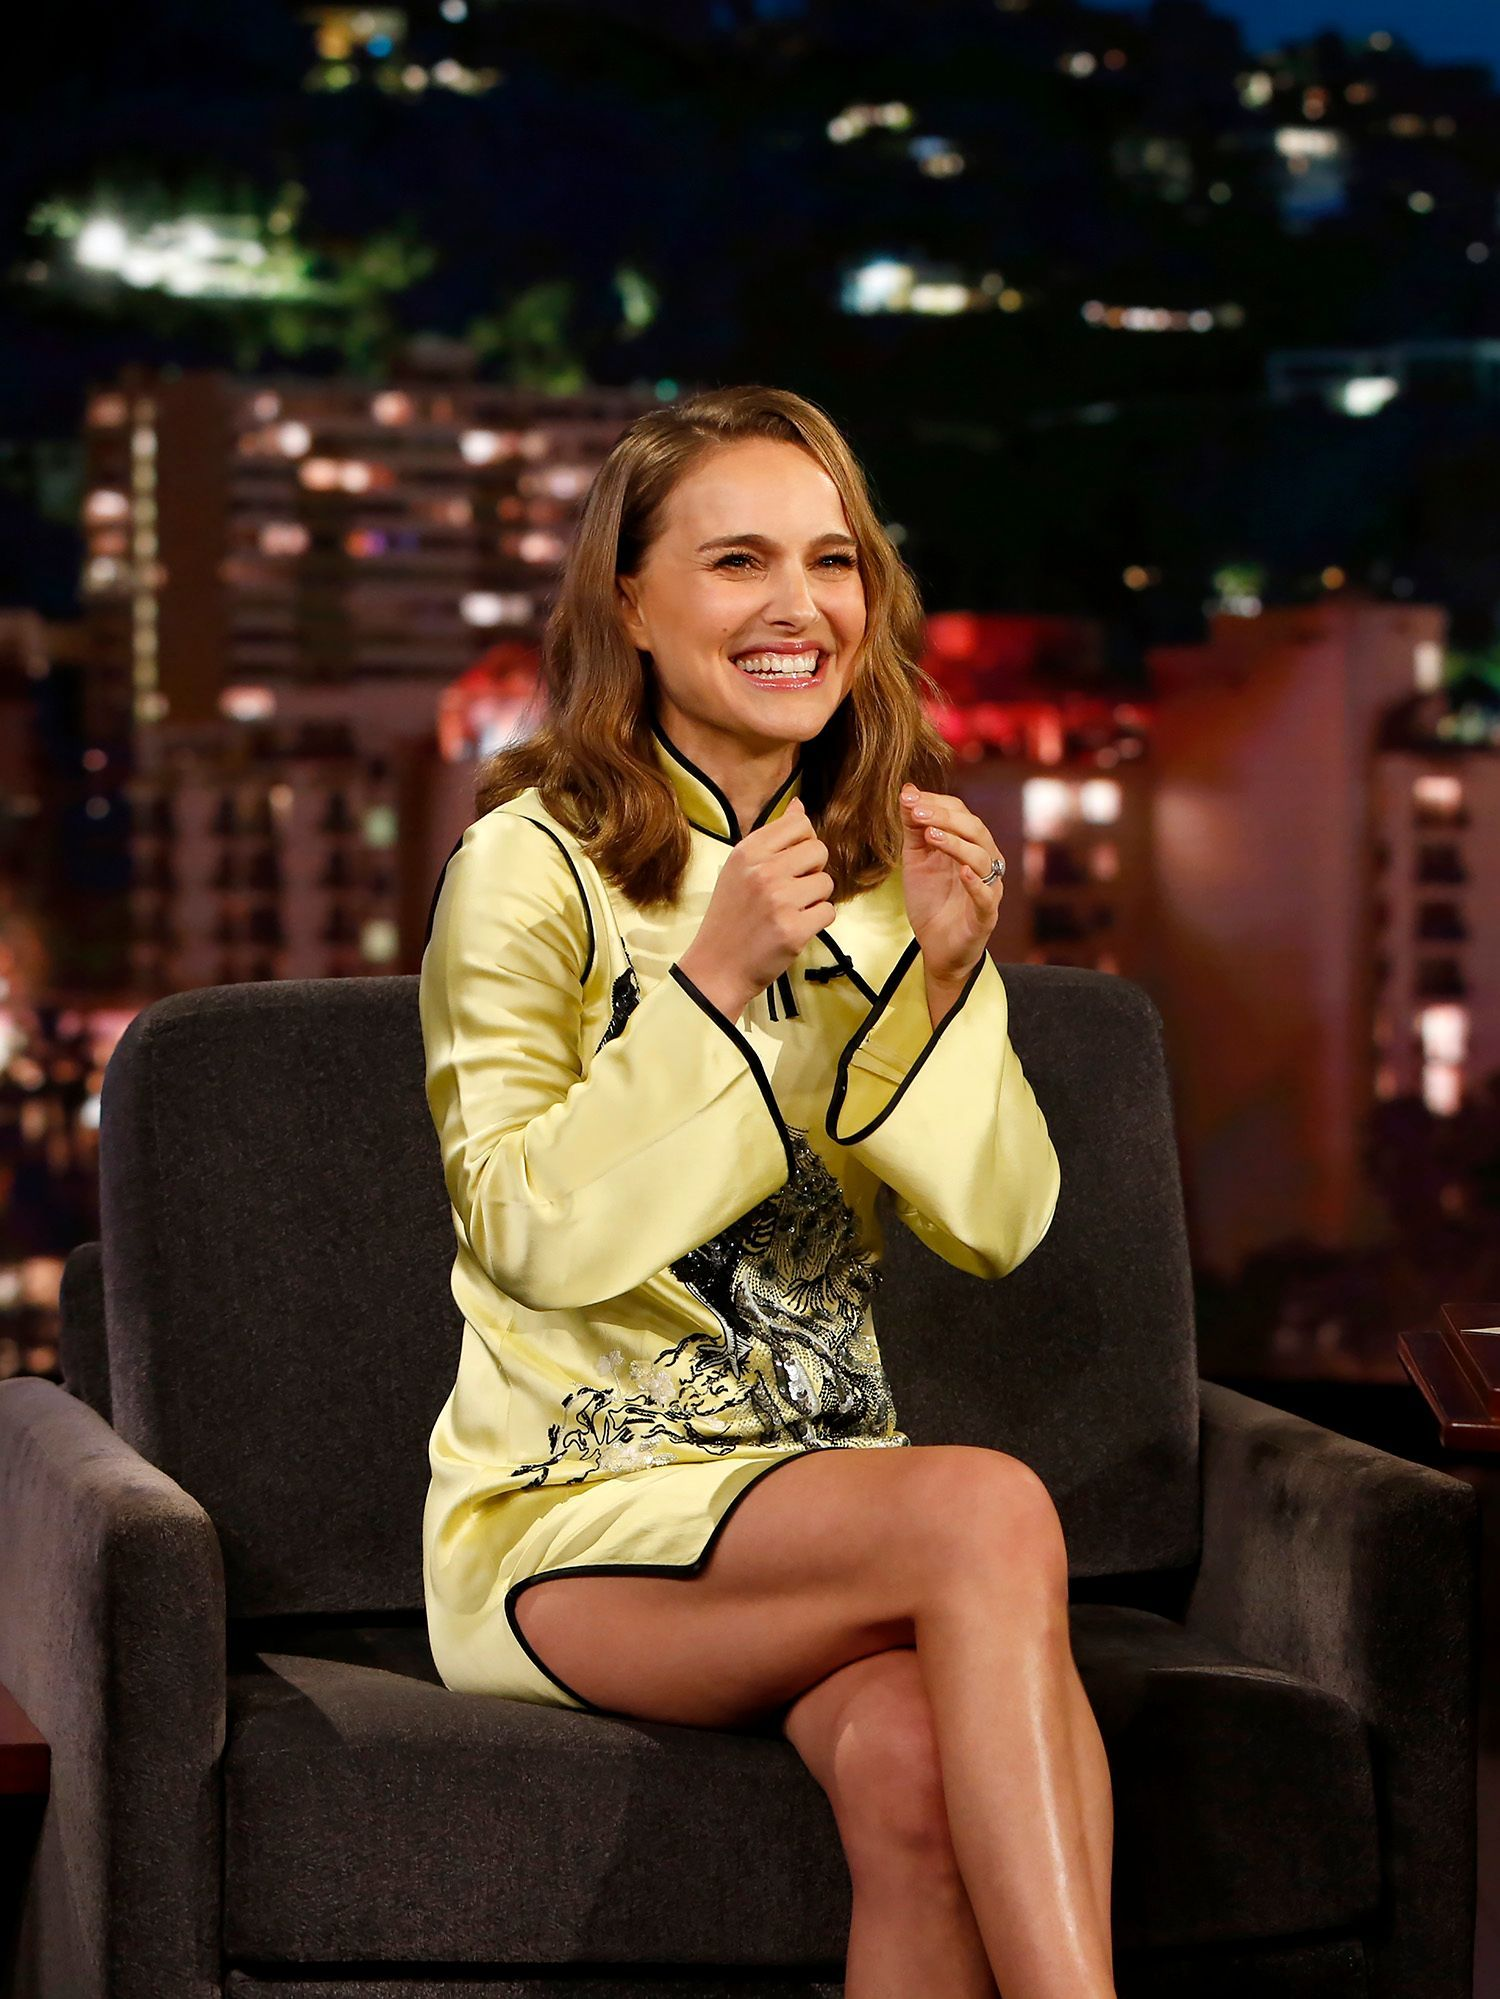 Natalie Portman #BeautifulFemales #hotwoman ( If you like my